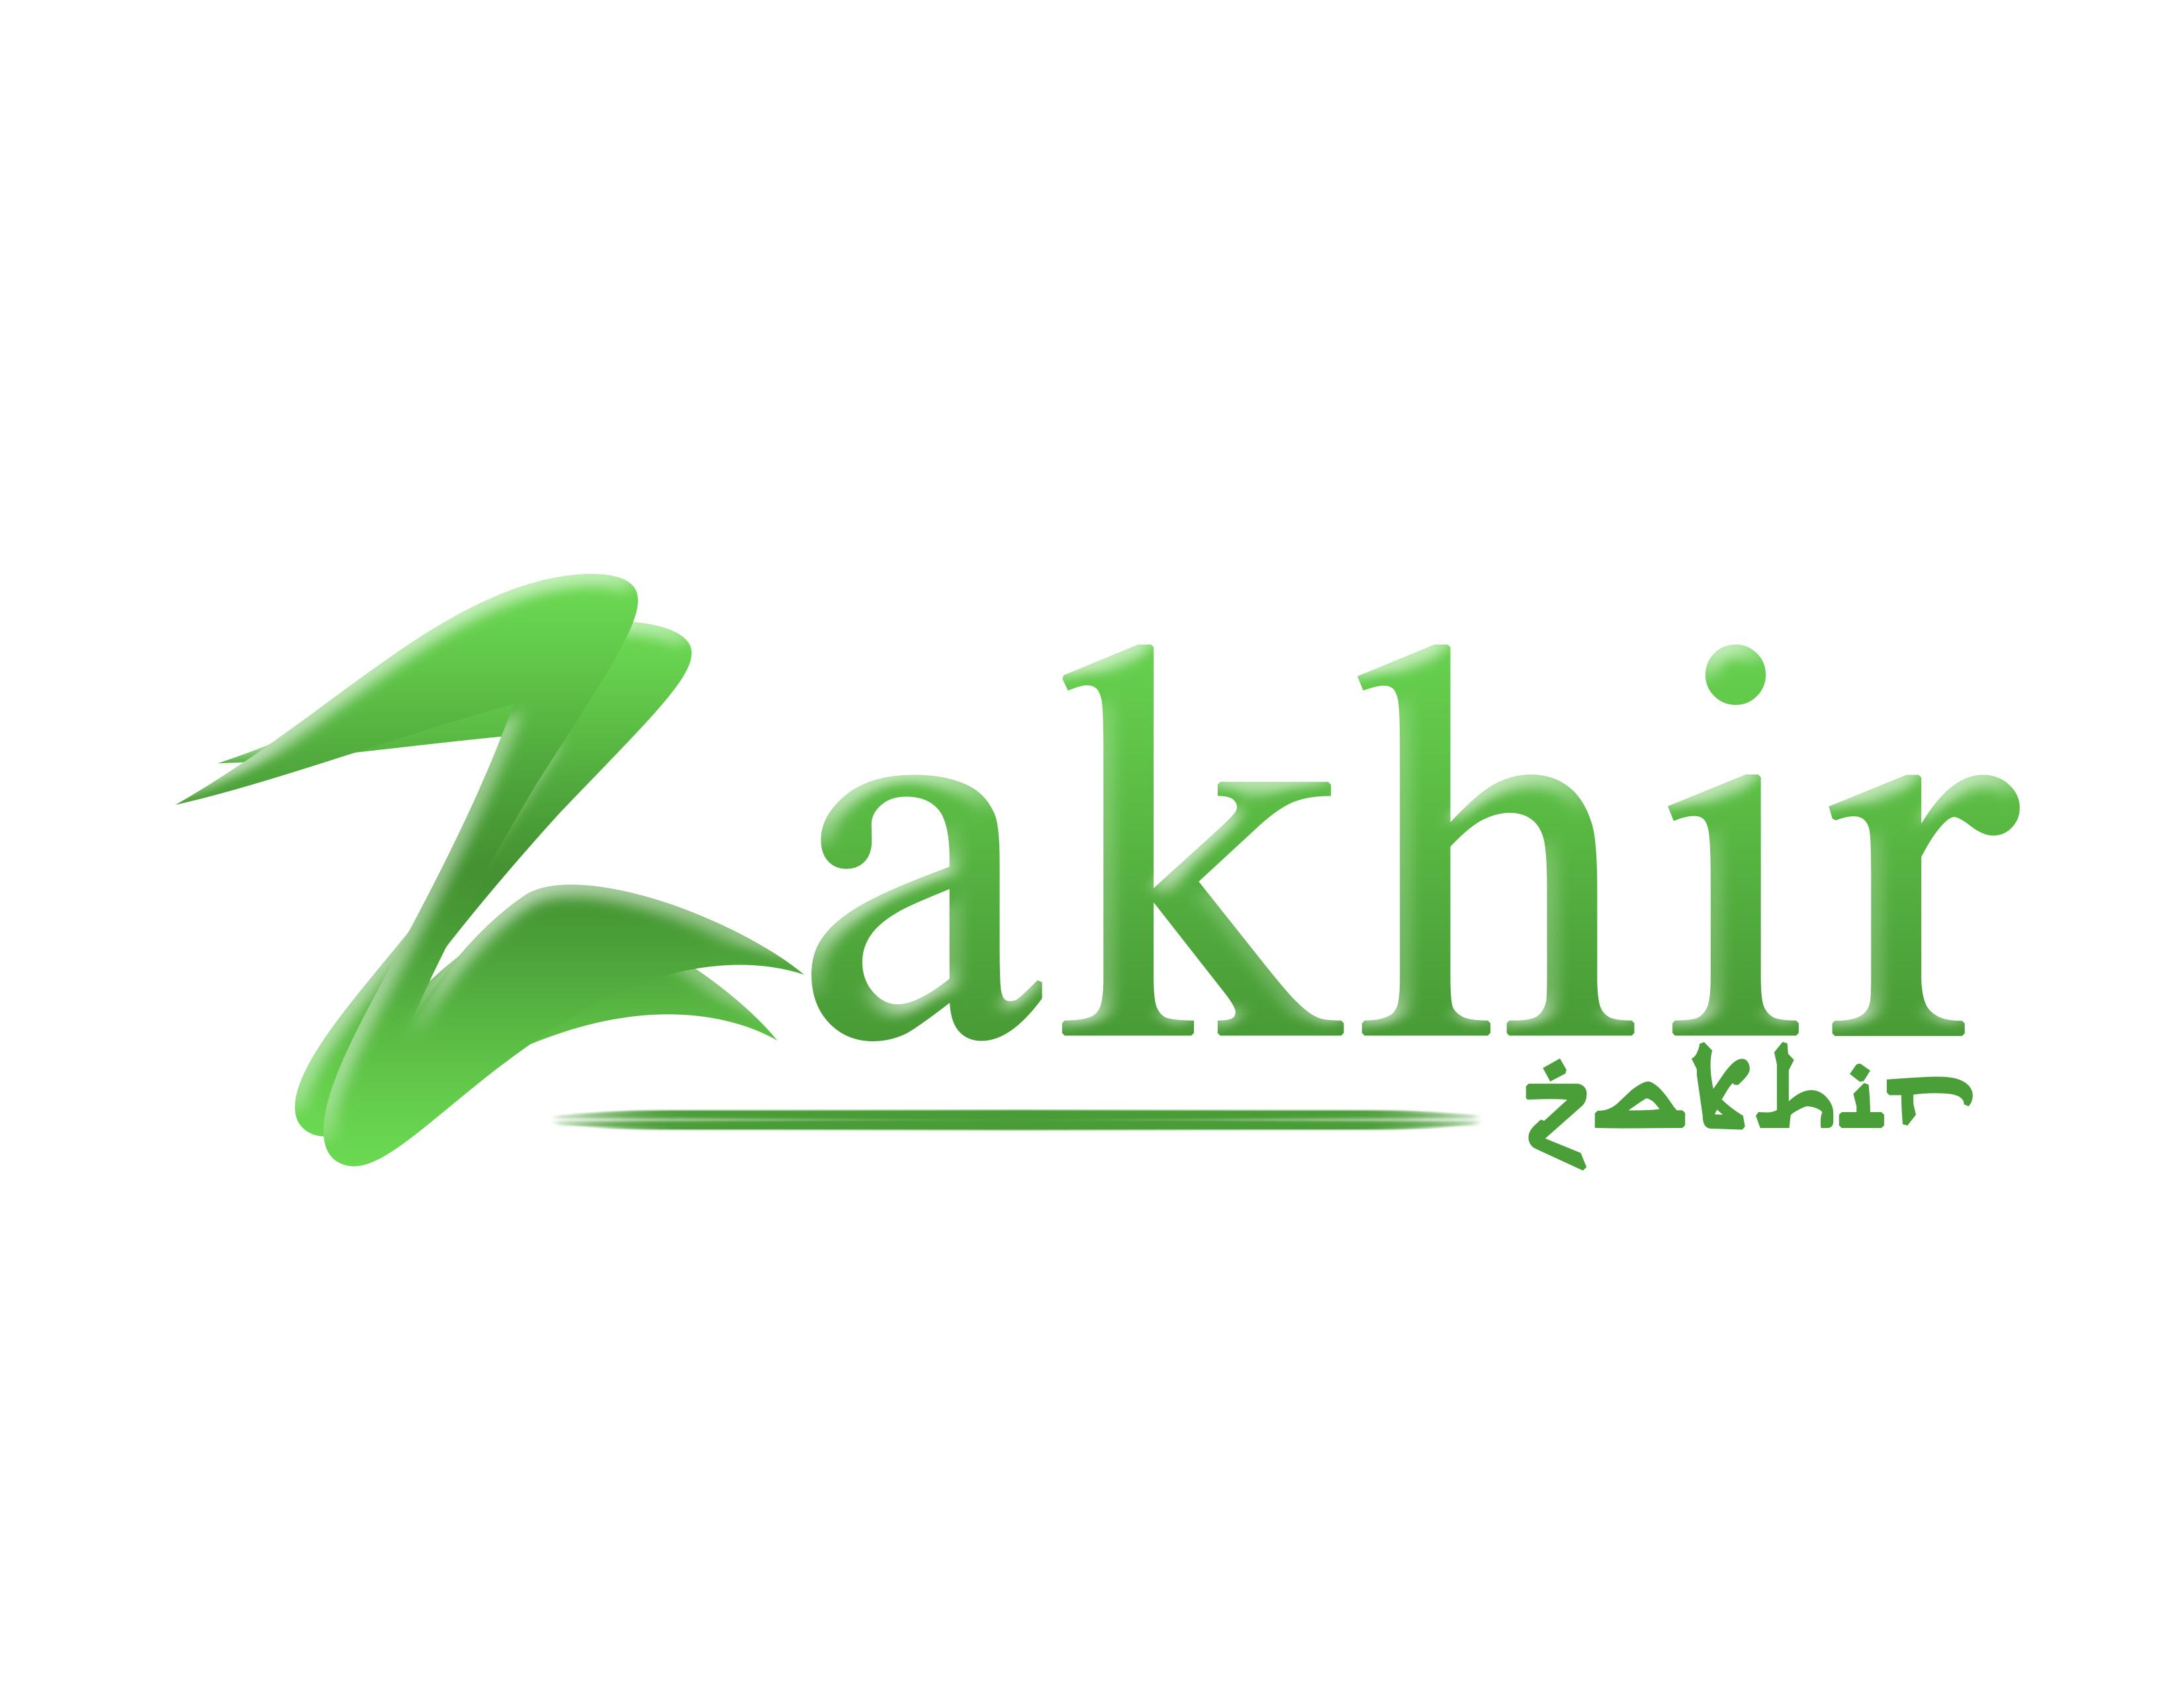 Logo Design by Private User - Entry No. 102 in the Logo Design Contest Zakhir Logo Design.